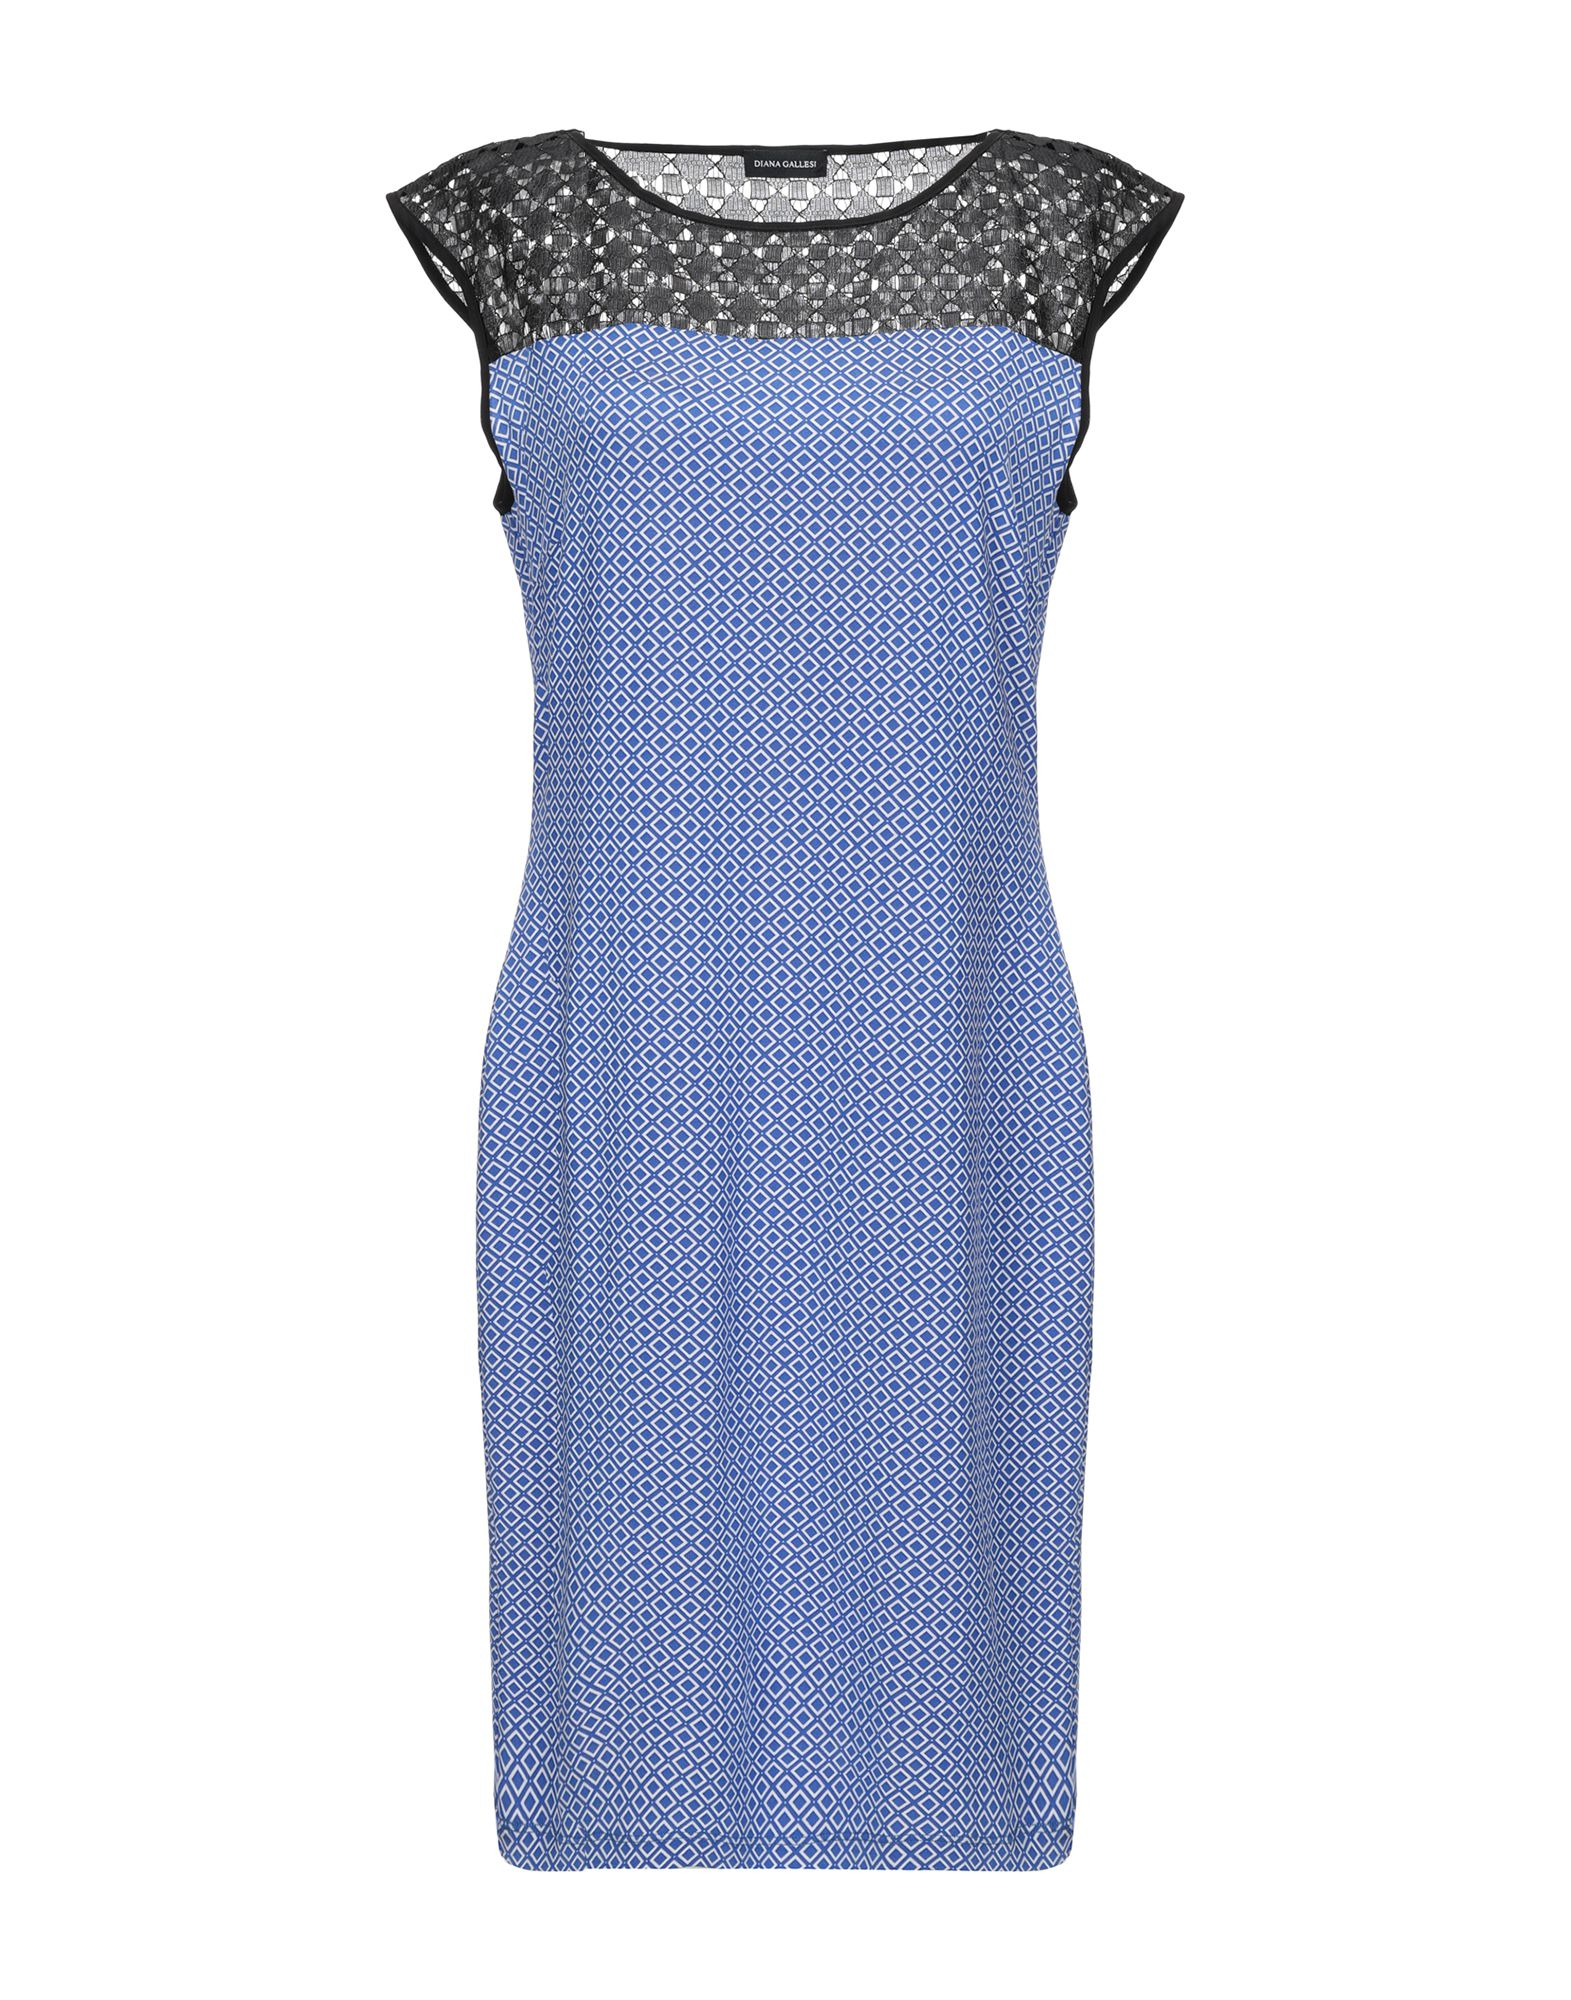 DIANA GALLESI Короткое платье maximumcatch 2 5wt 6 5 9ft pink fly rod 4pieces 30t carbon fiber medium fast fly fishing rod for ladies